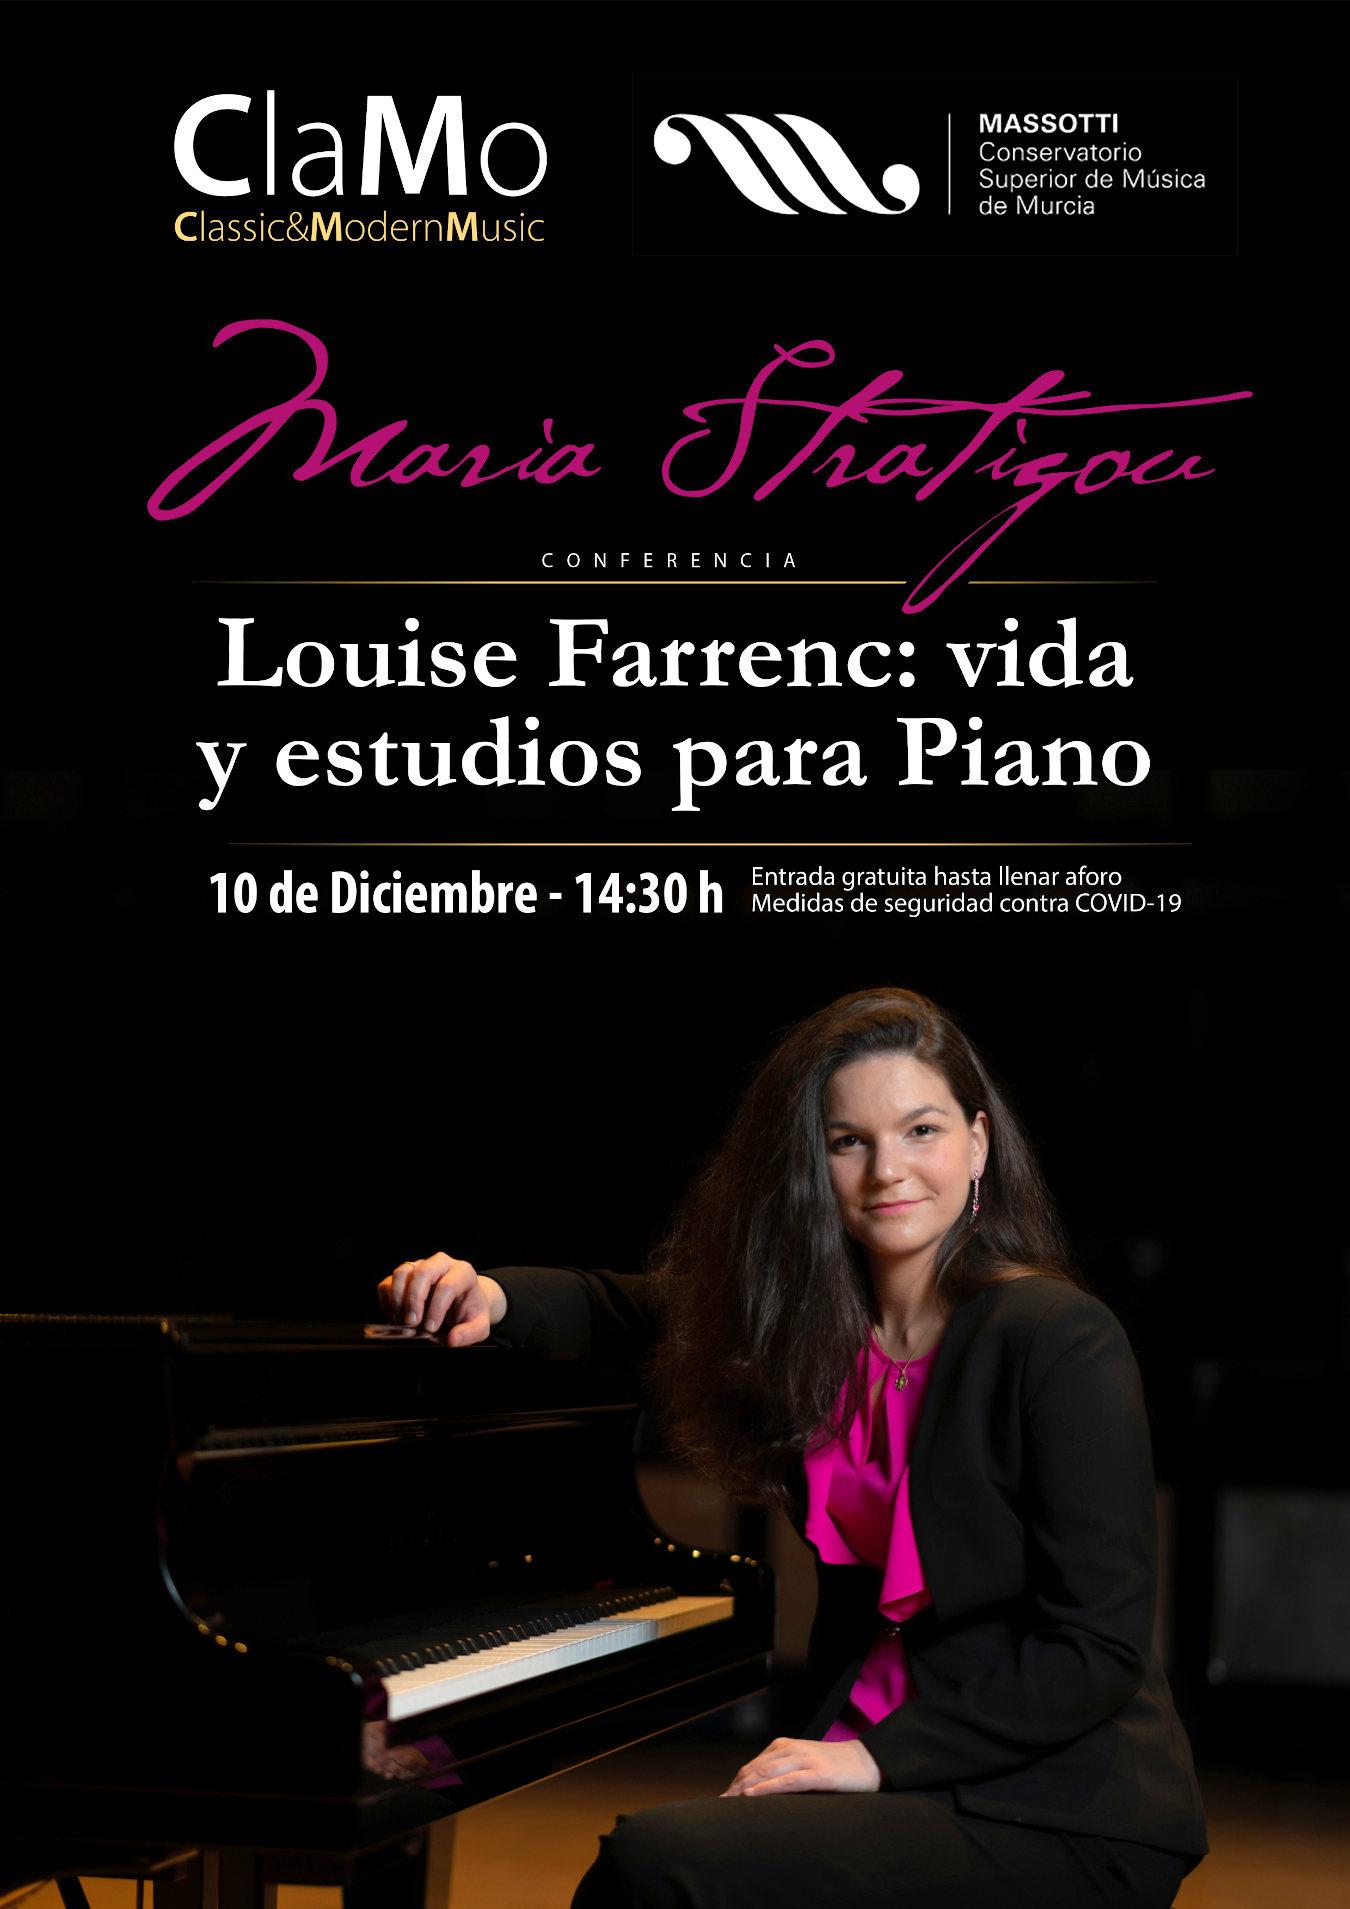 Conferencia Maria Stratigou Conservatorio Superior de Música de Murcia 2021